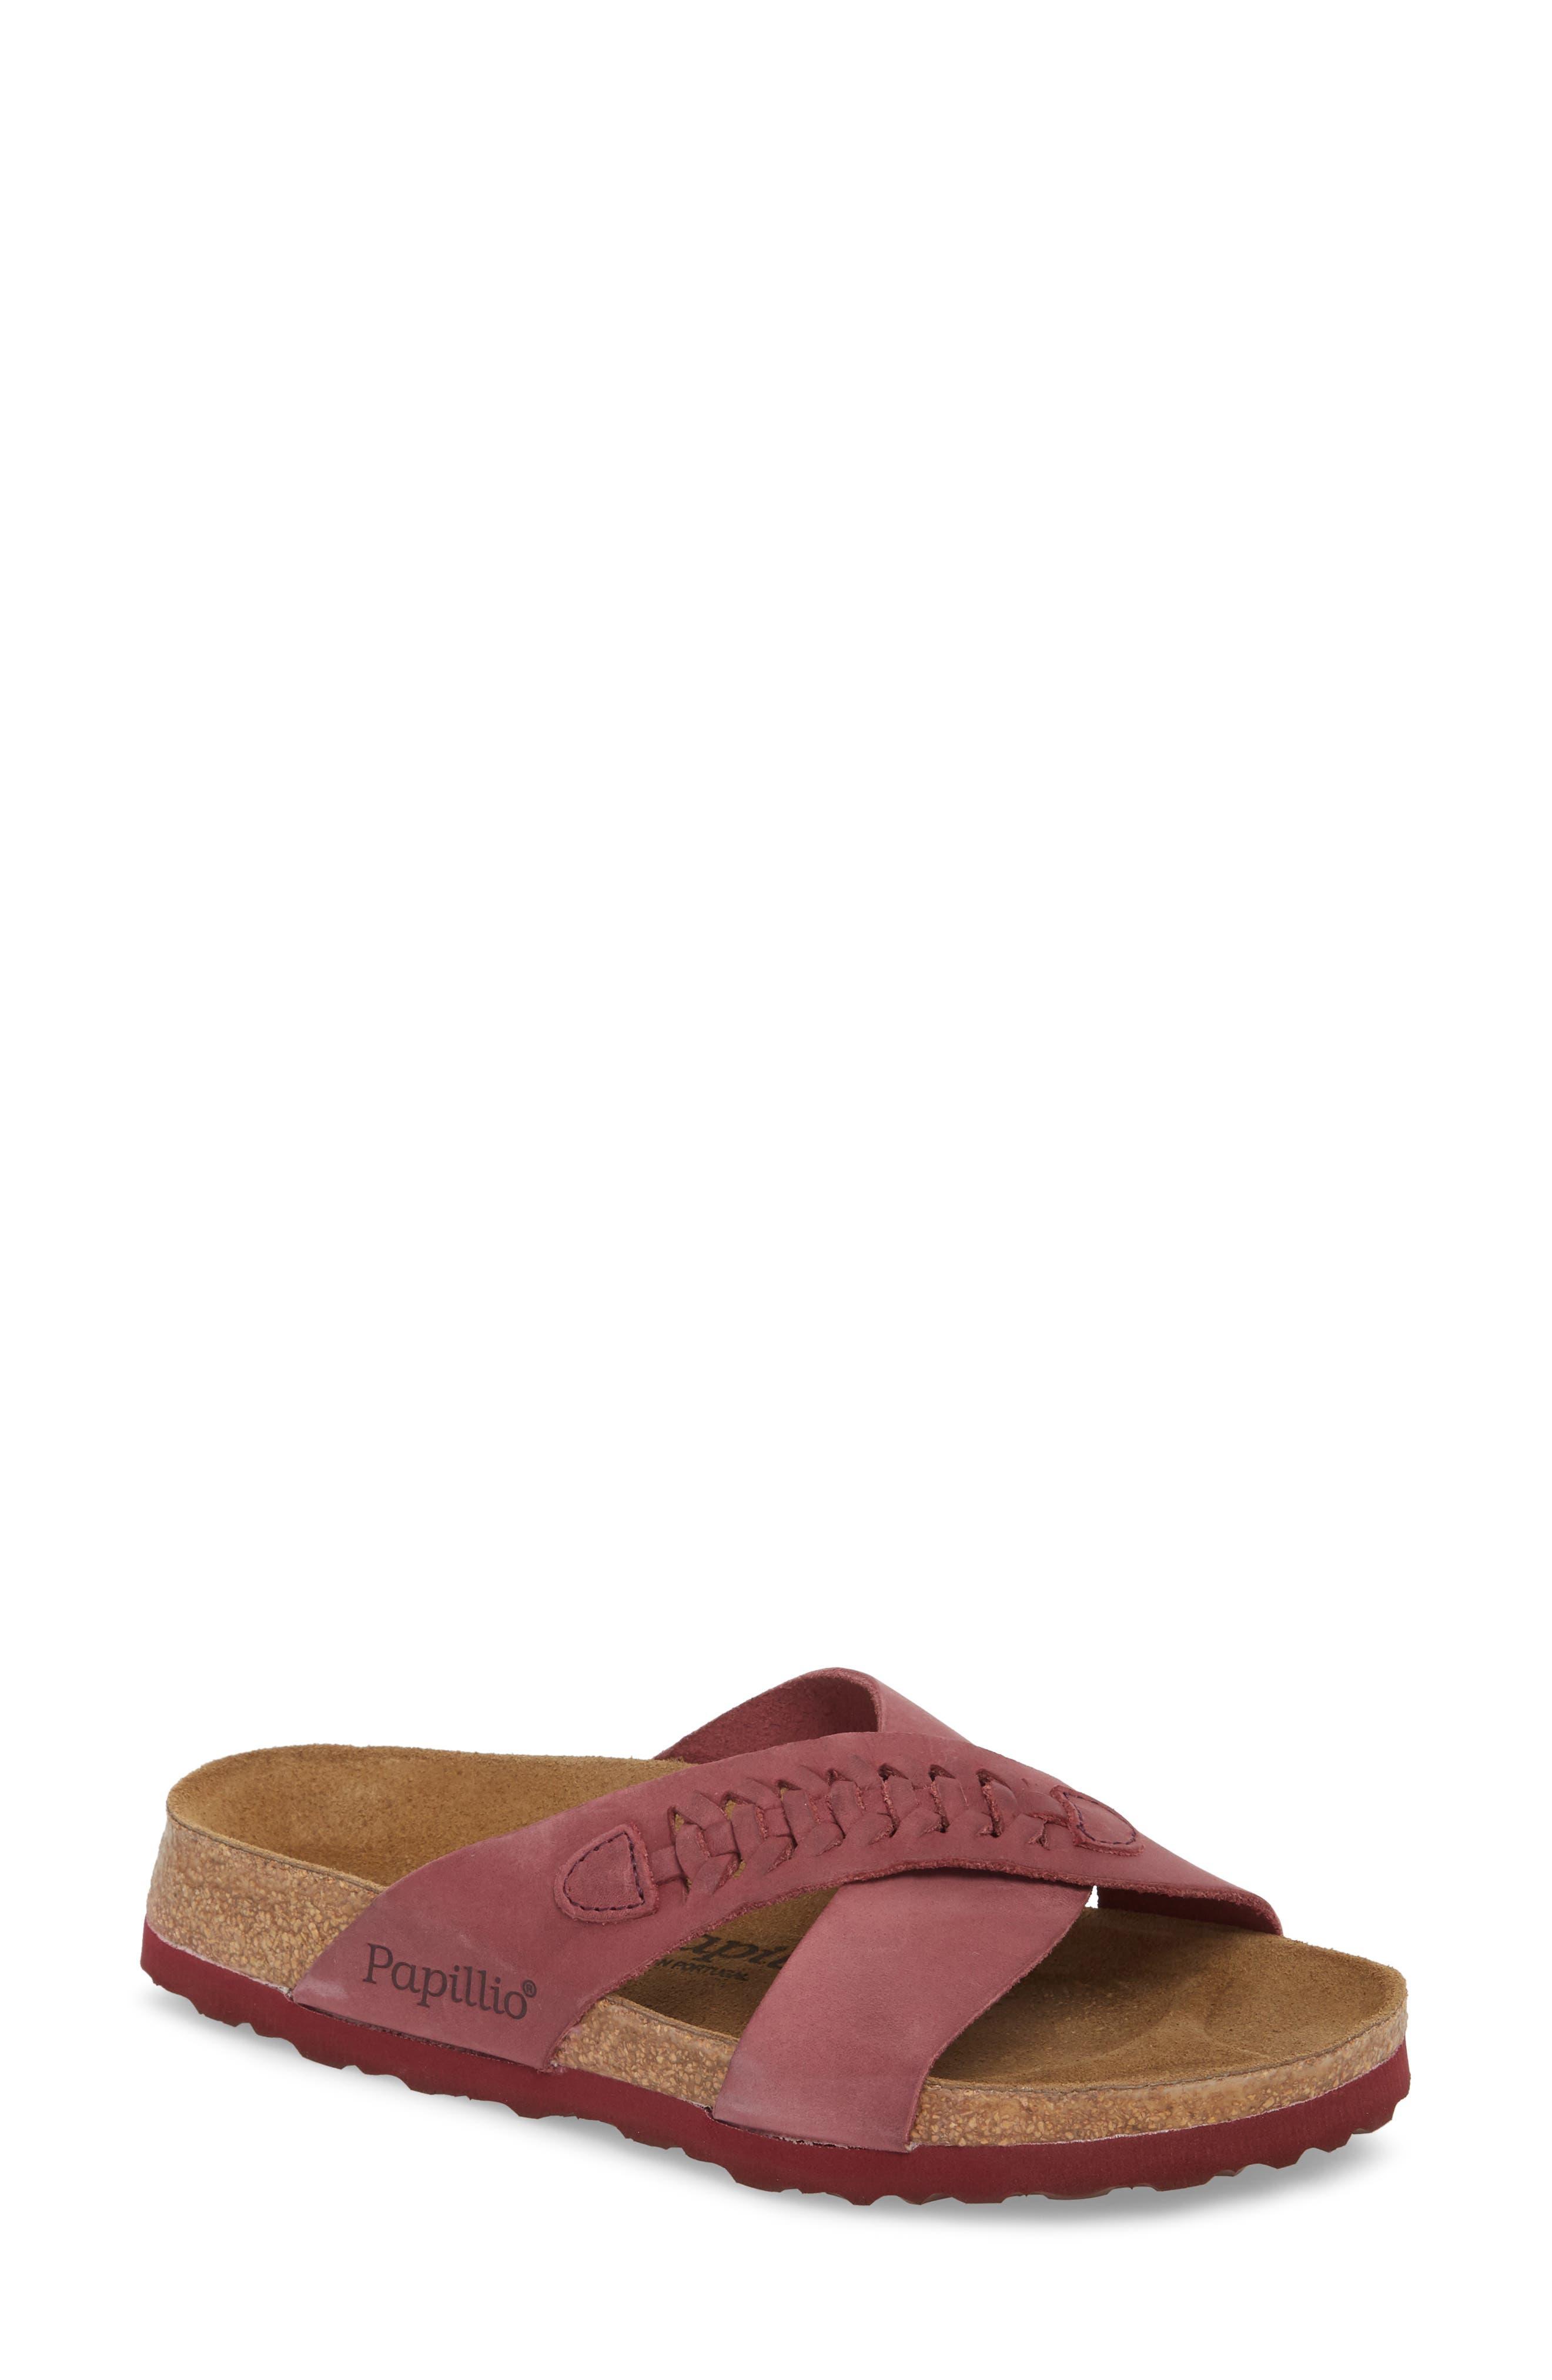 Papillio by Birkenstock Daytona Slide Sandal,                             Main thumbnail 1, color,                             Woven Wine Nubuck